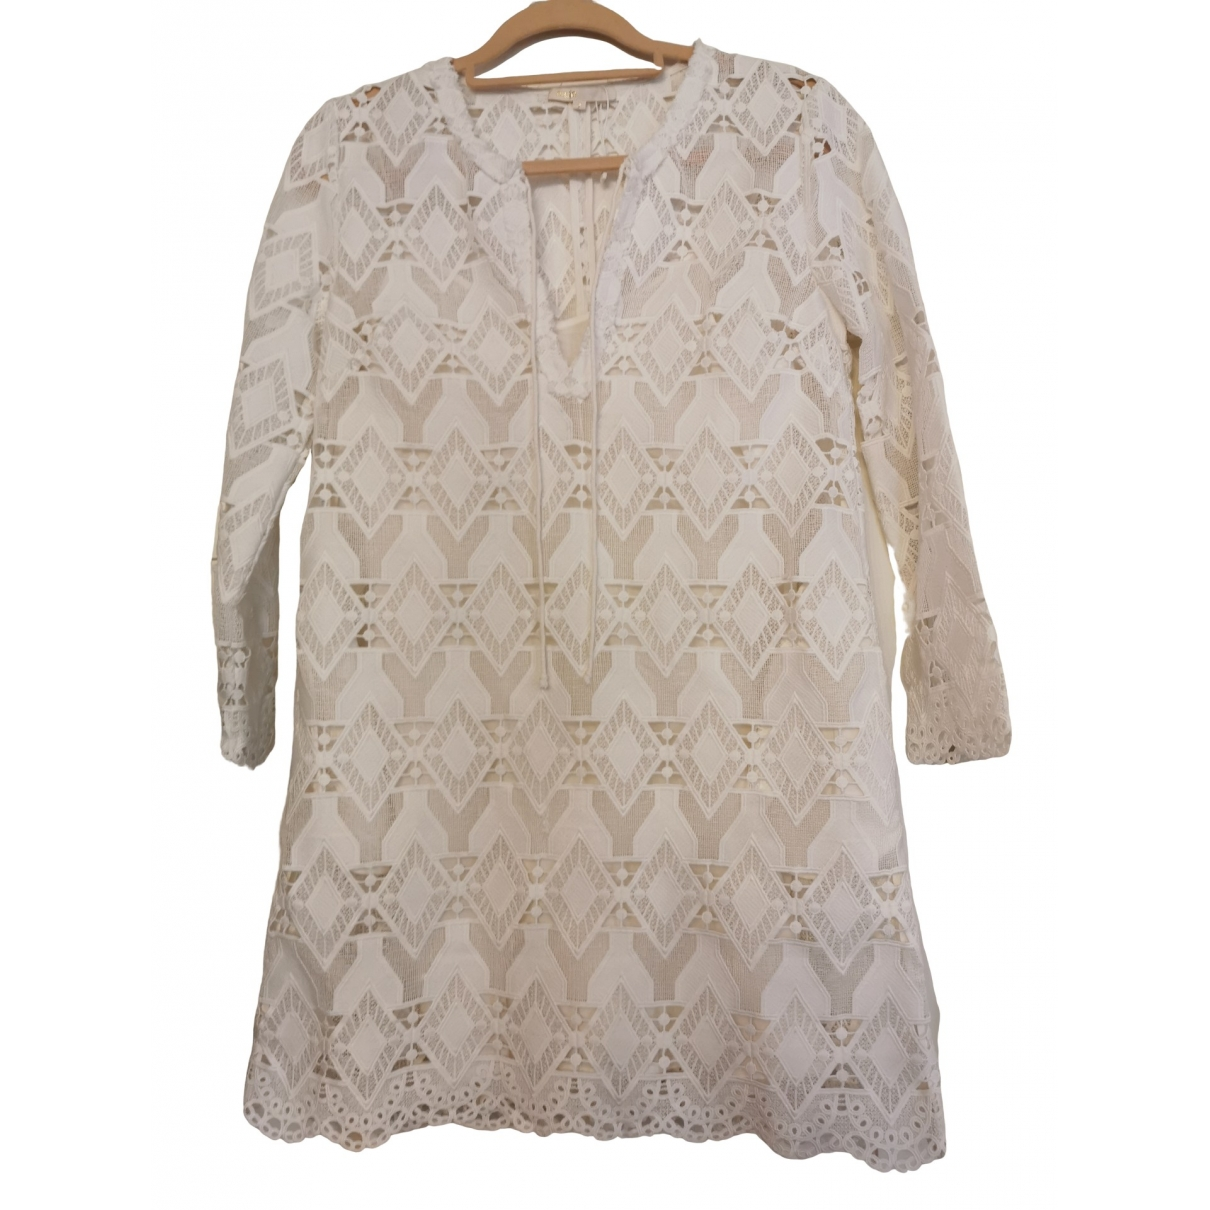 Maje \N White Lace dress for Women 10 UK